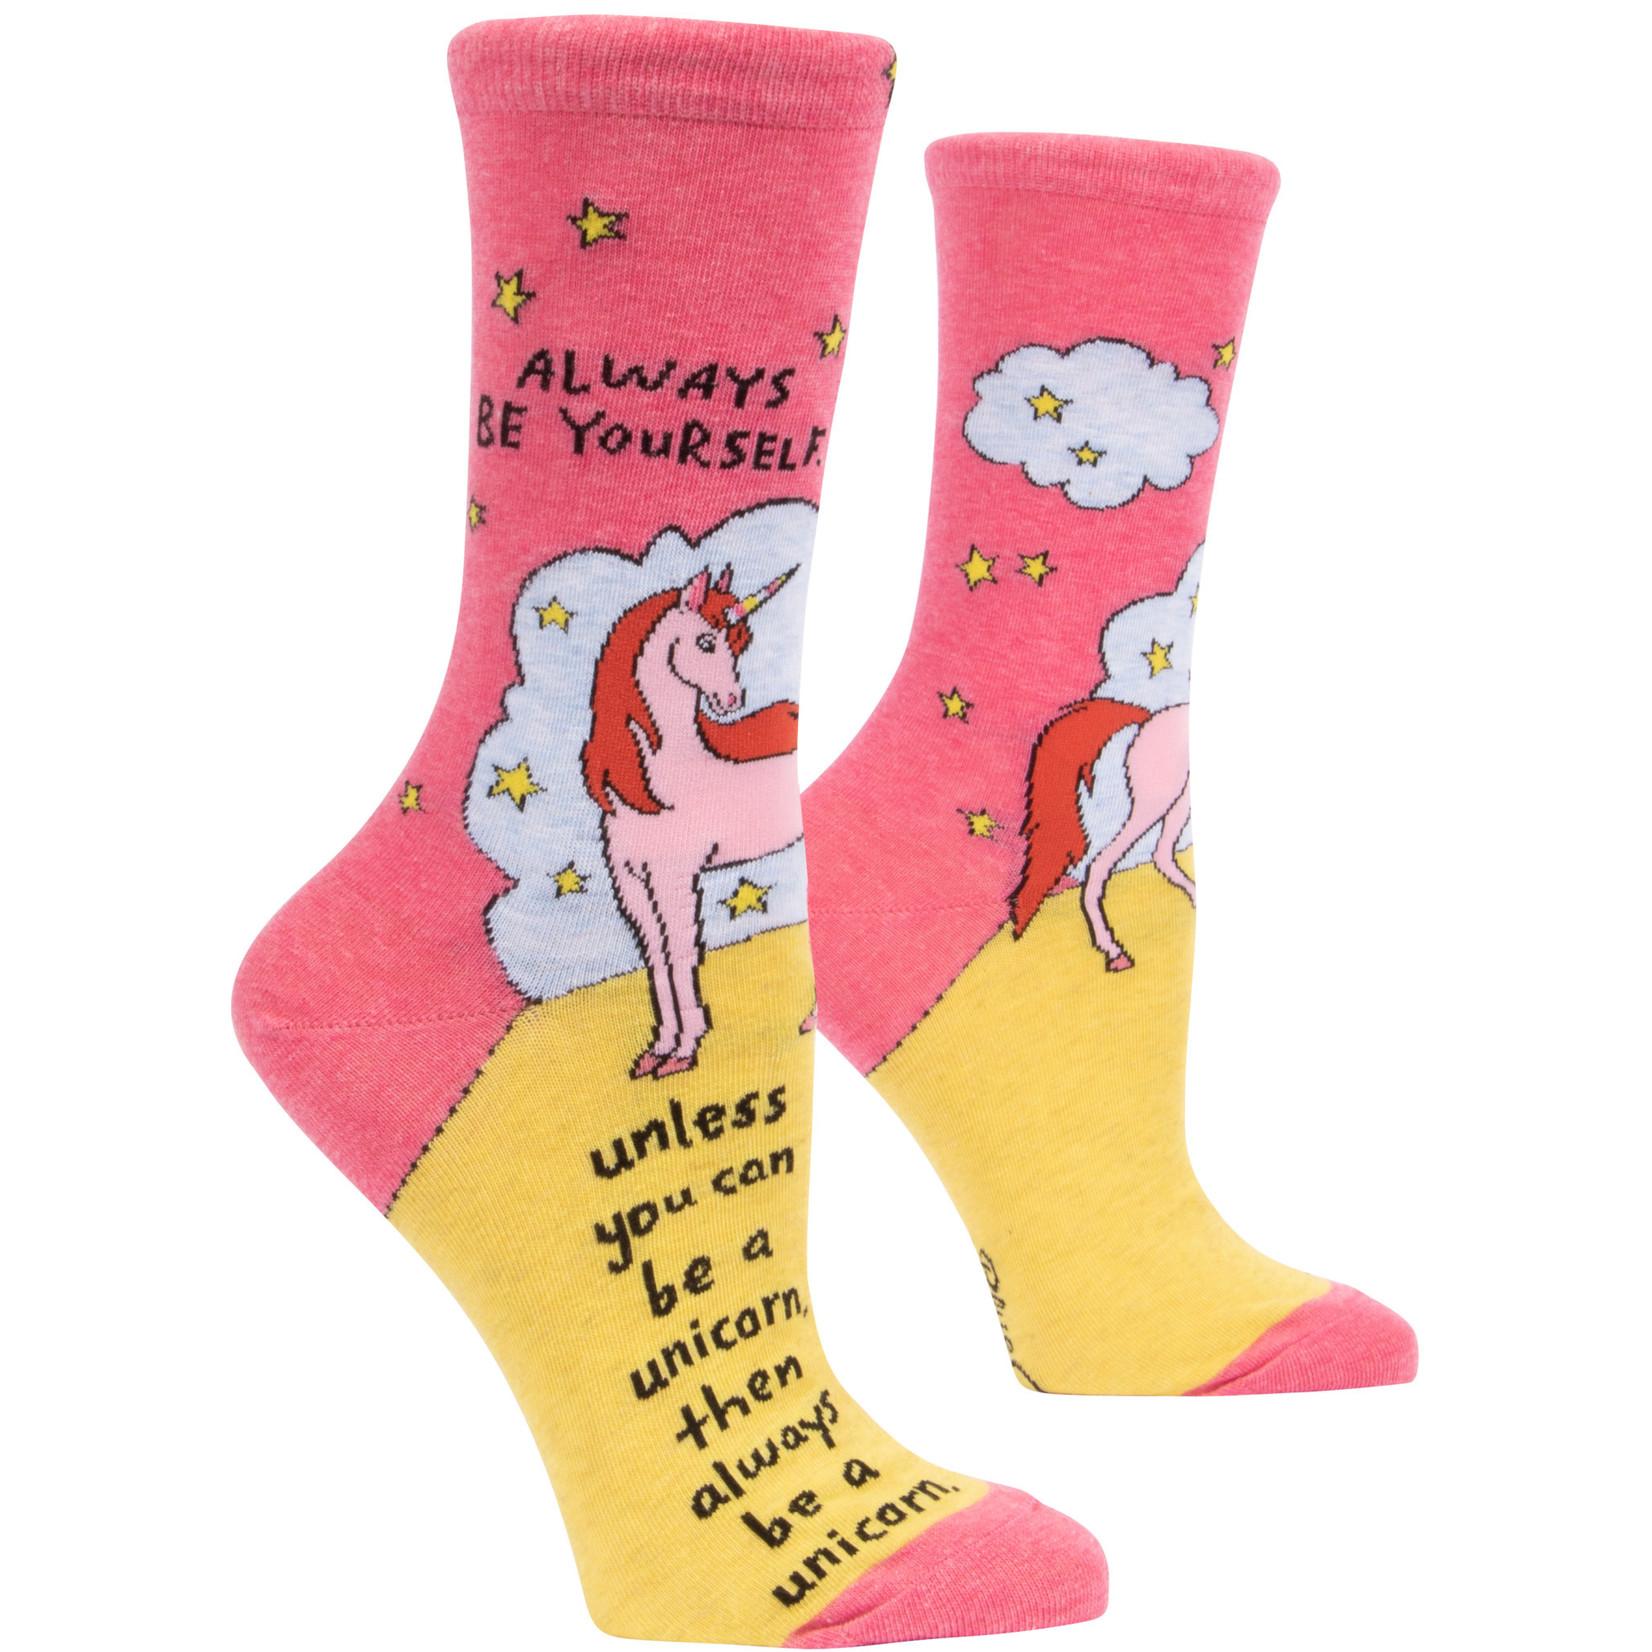 Blue Q Womens Crew Socks - Always Be A Unicorn